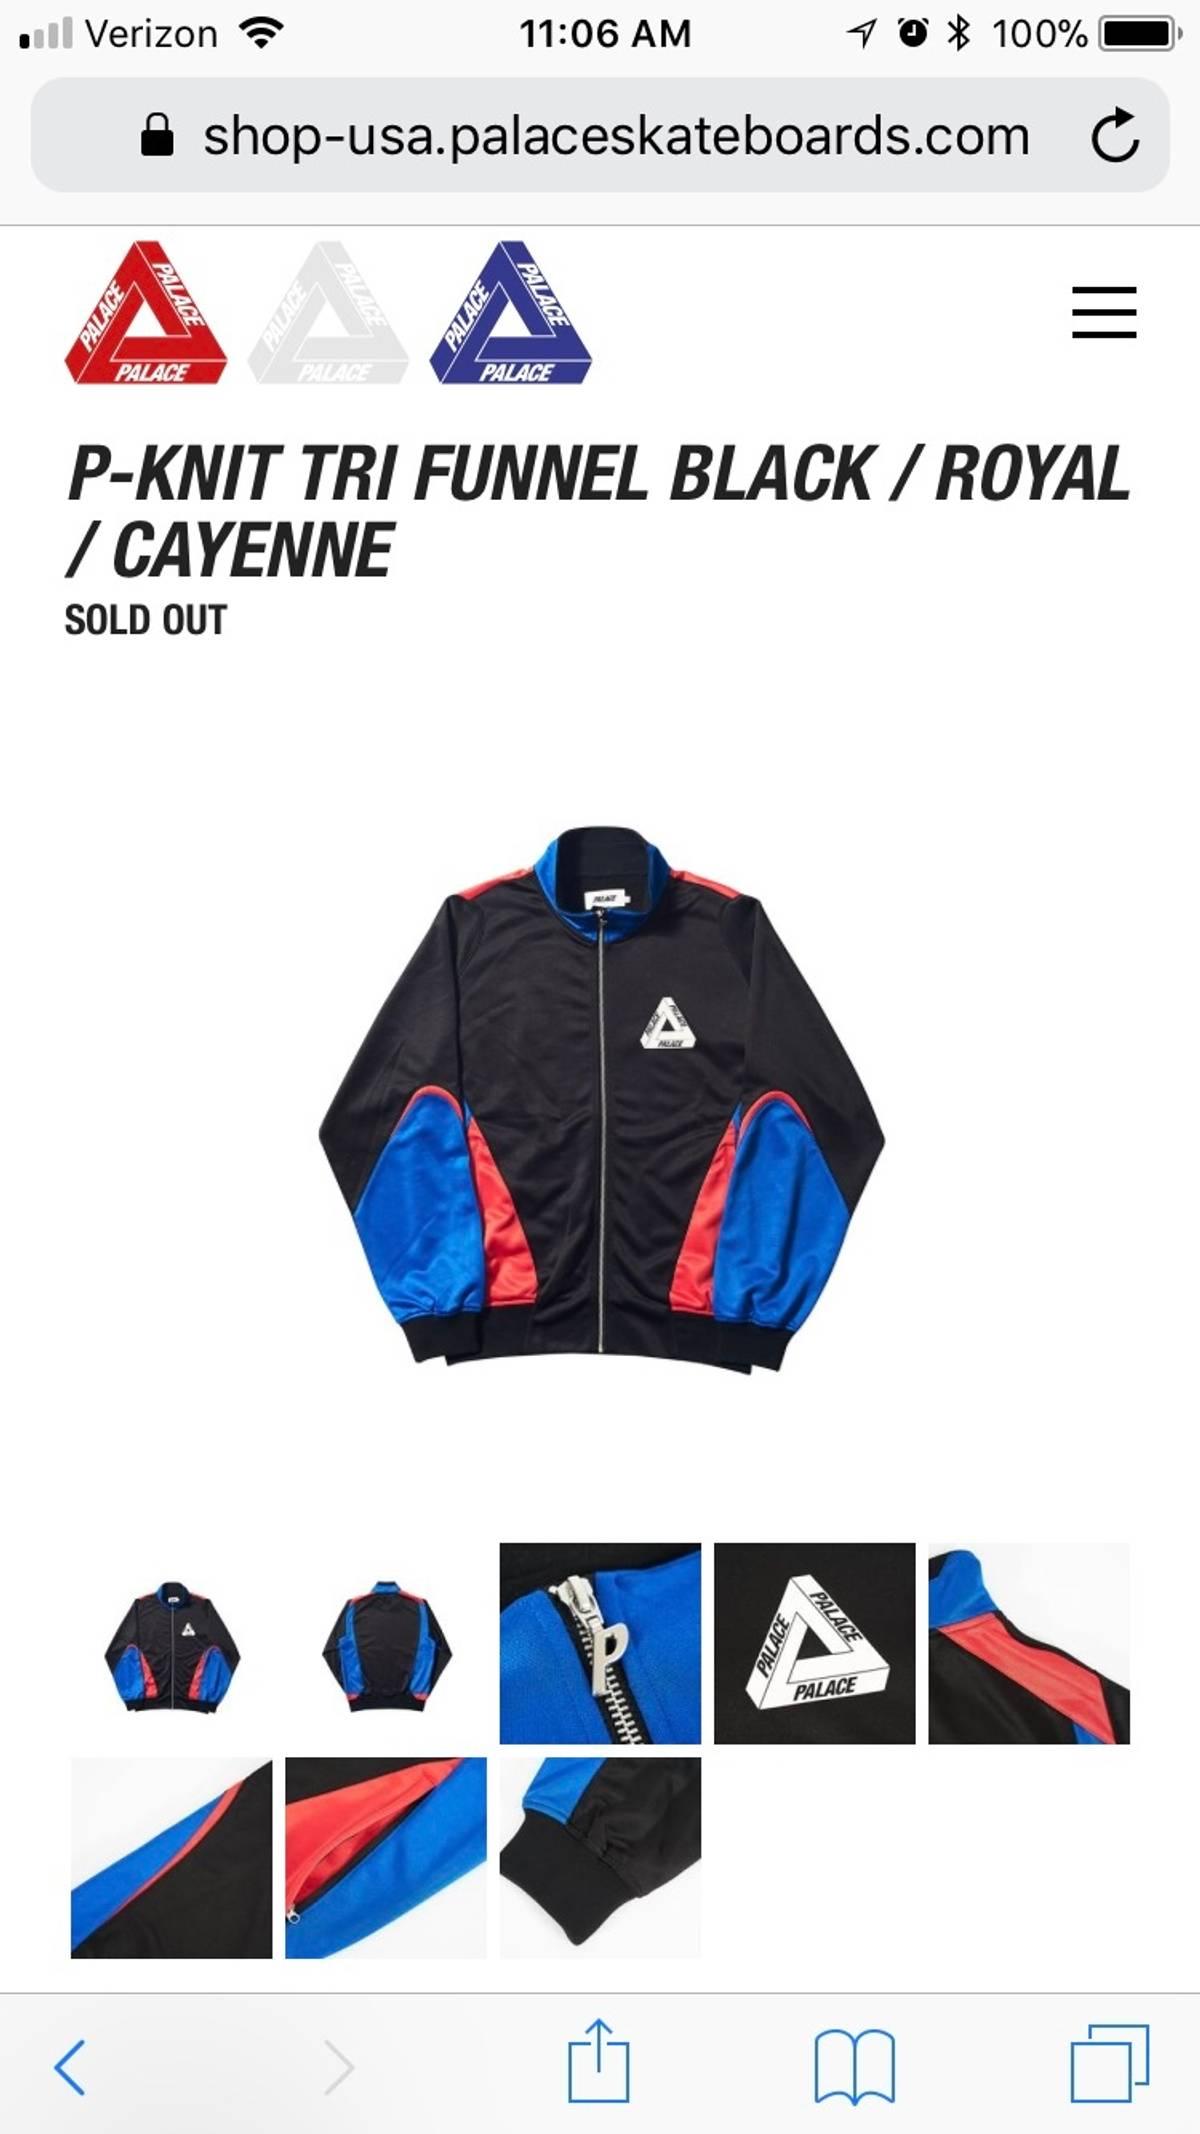 14c0857ac047 Palace P-Knit Tri Funnel Track Jacket Black Royal Cayenne Size xl - Light  Jackets for Sale - Grailed